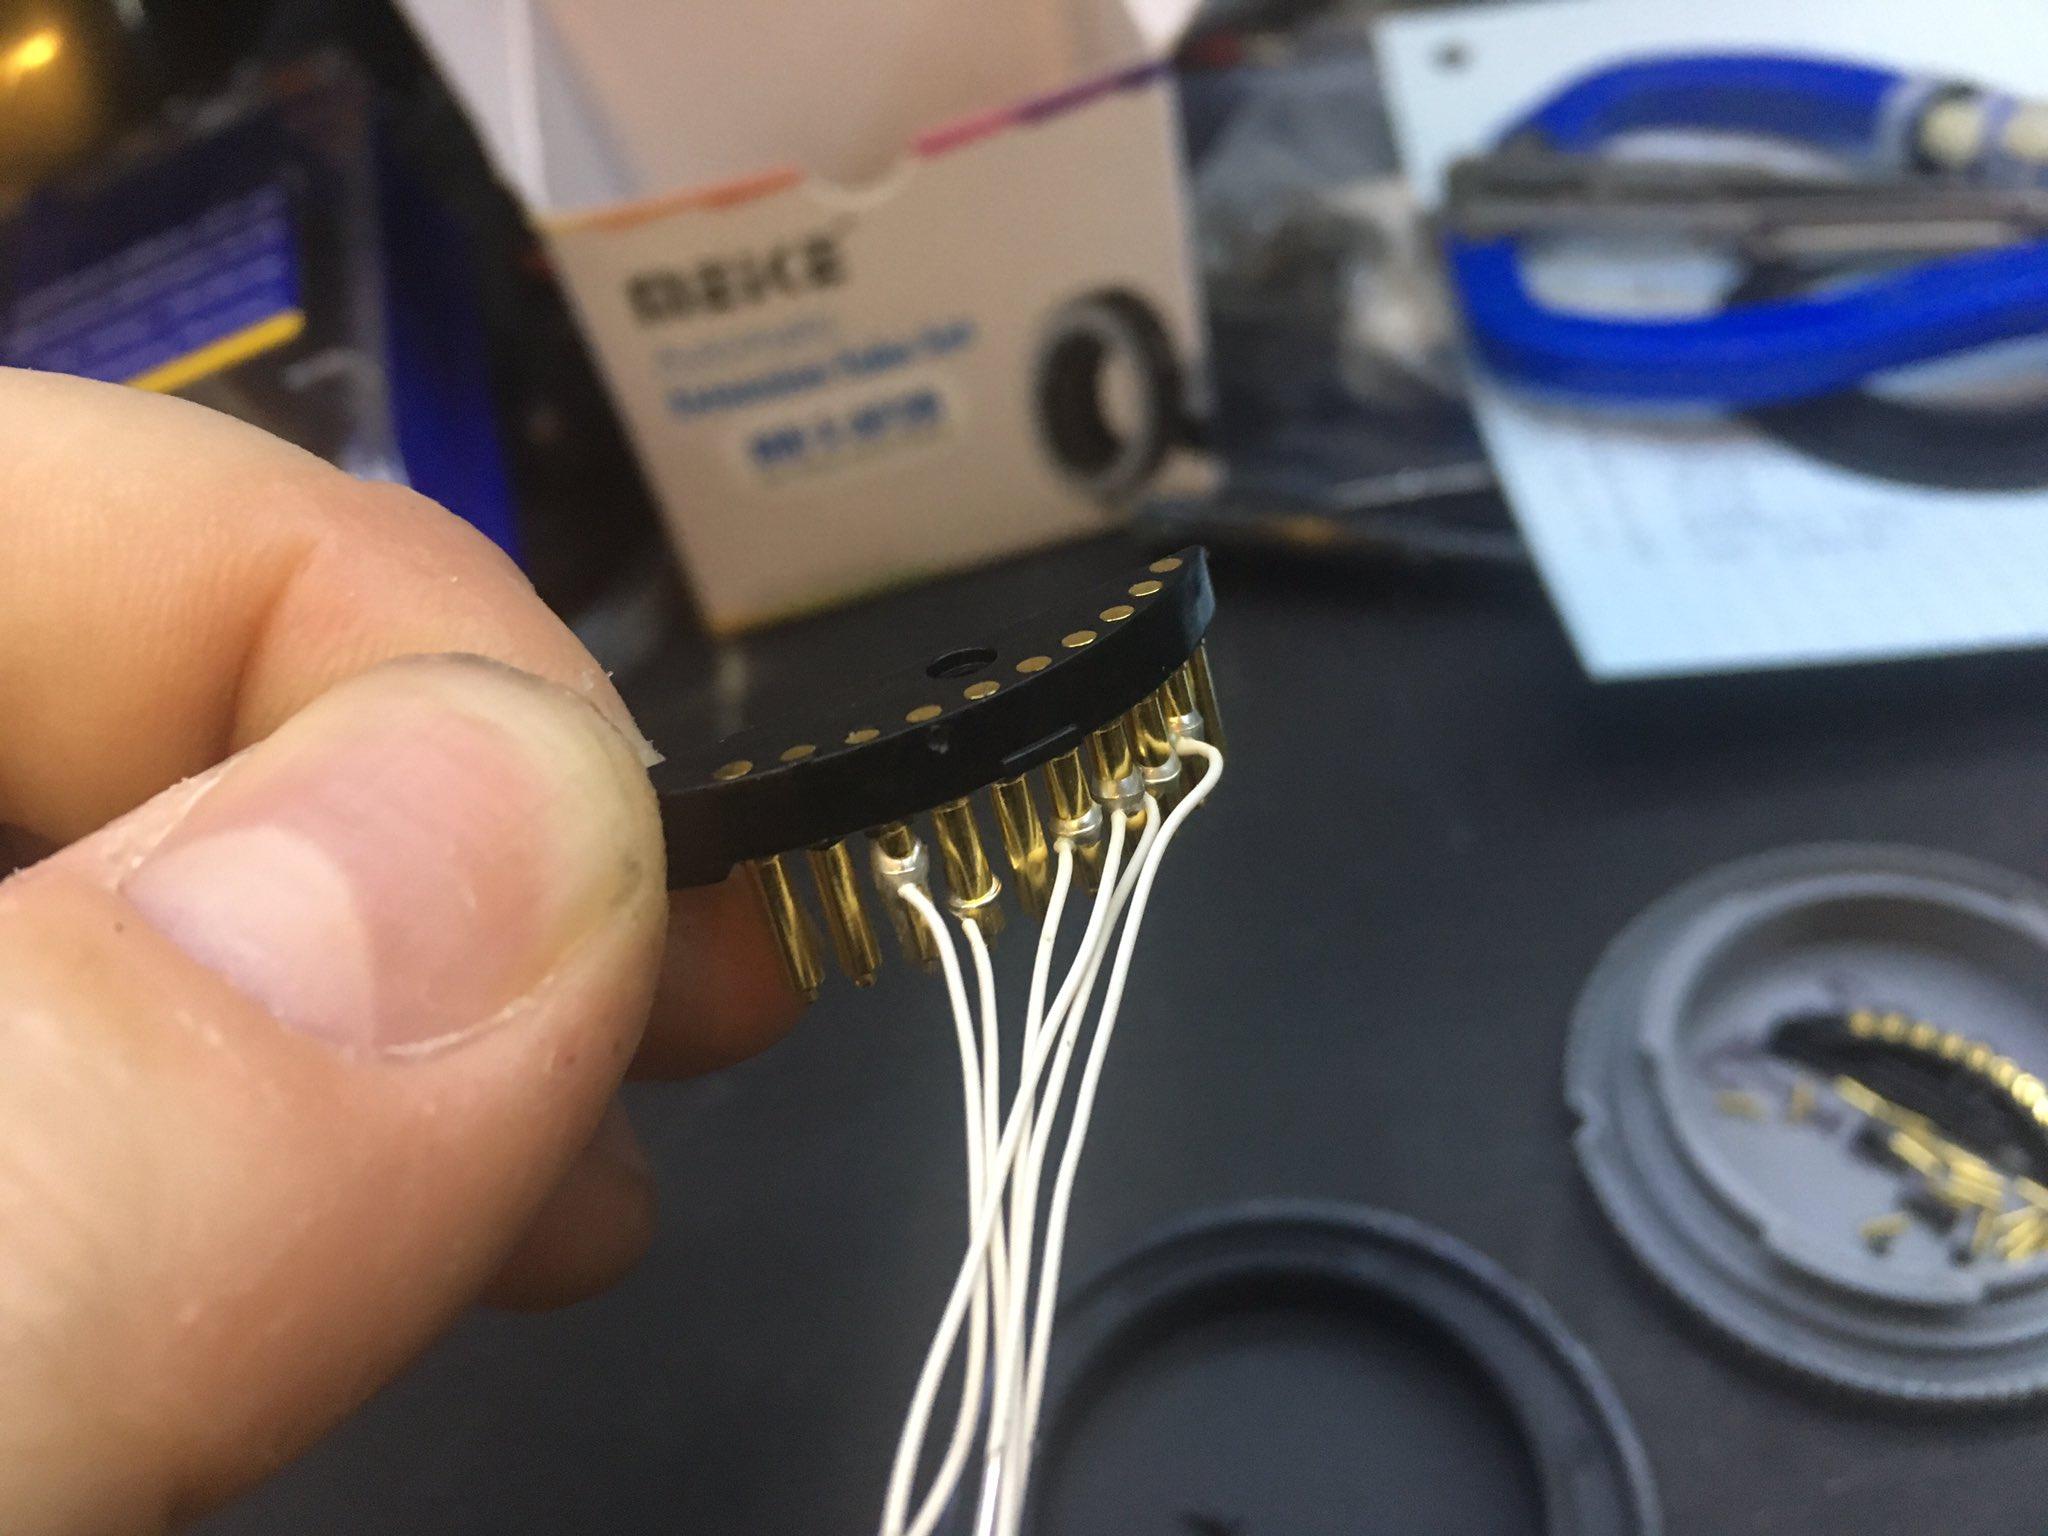 Sony E-Mount pins 1